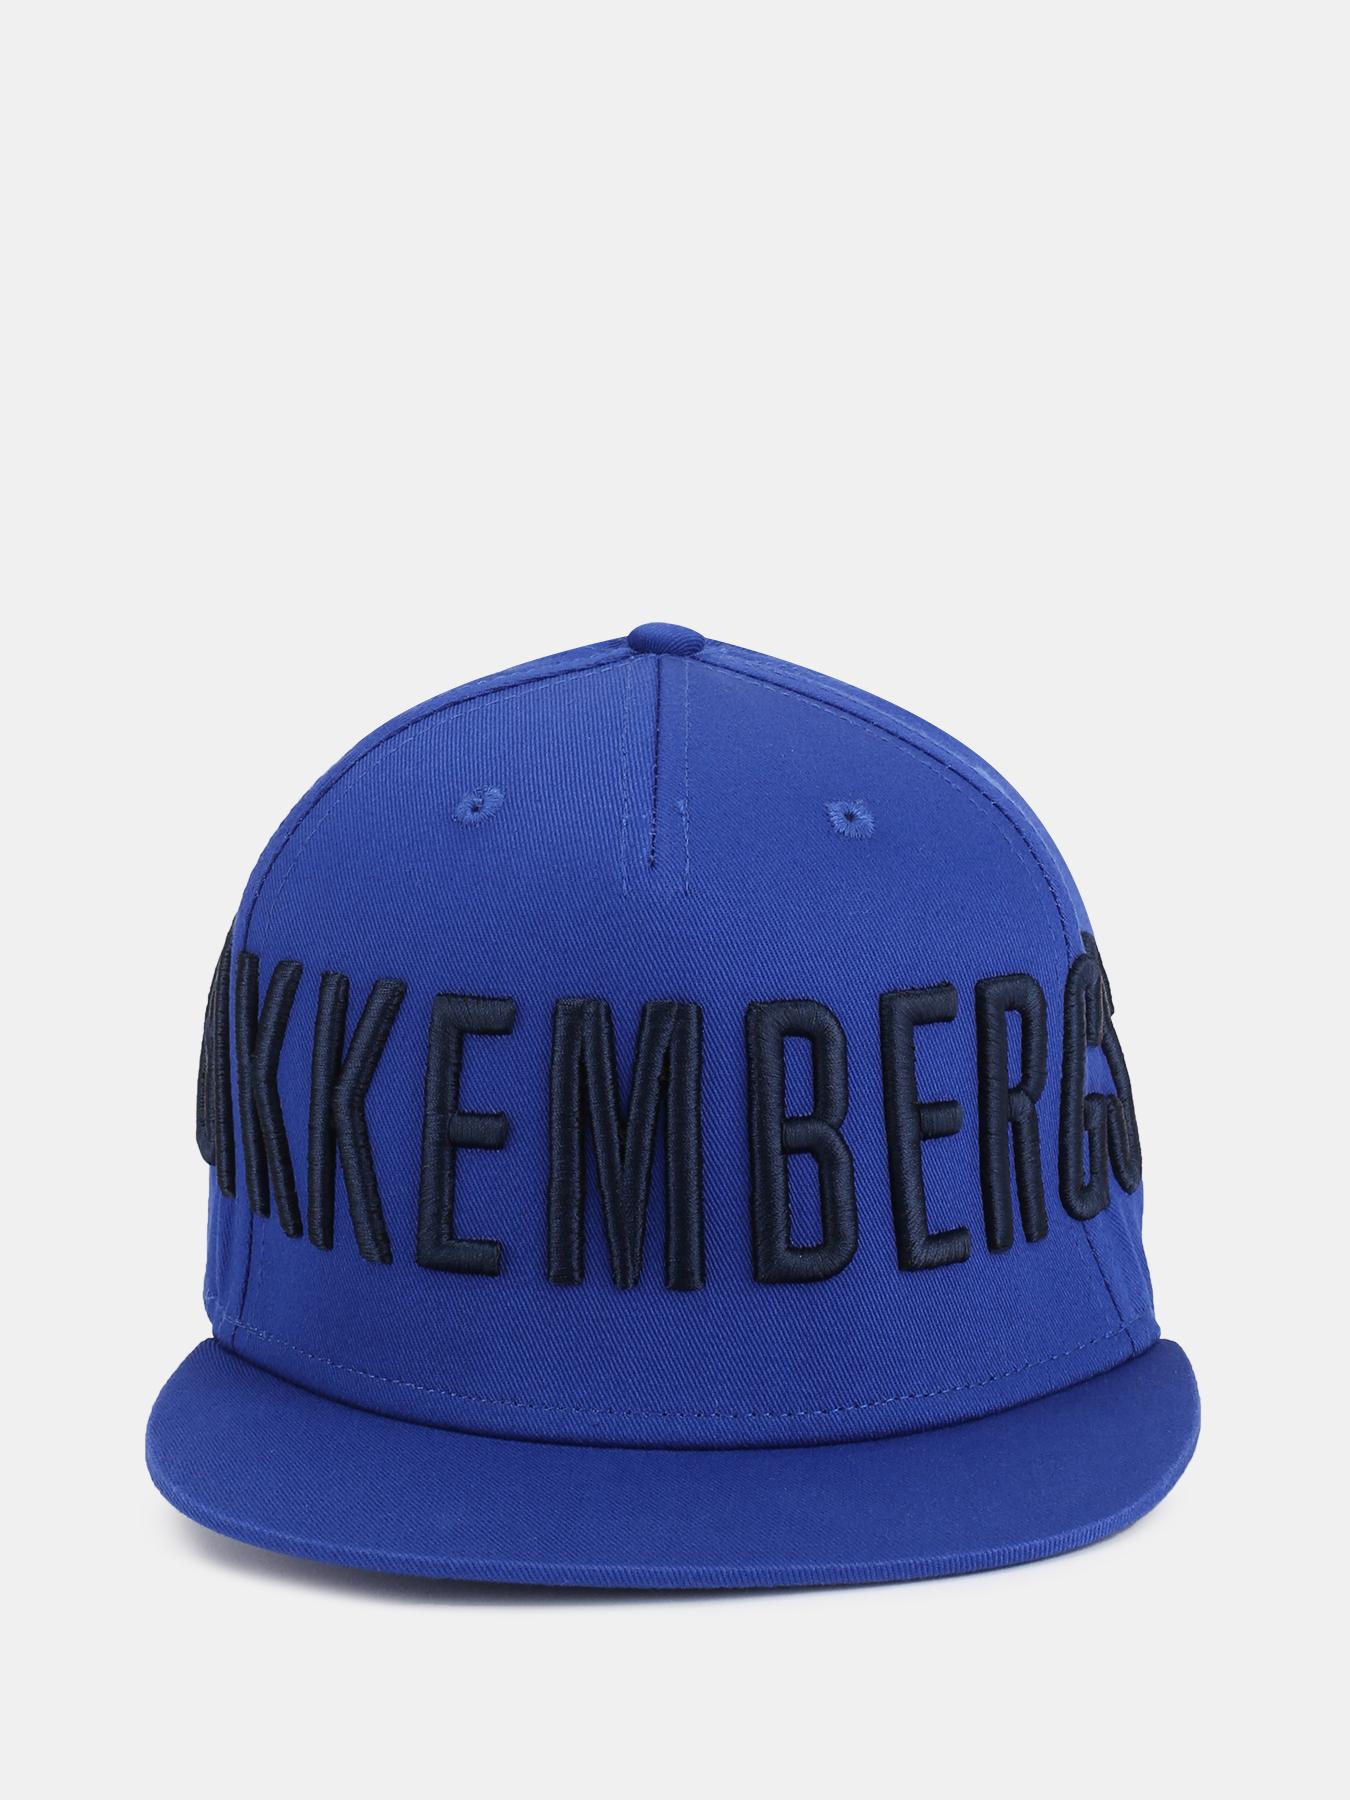 Кепи Bikkembergs Бейсболка с надписью